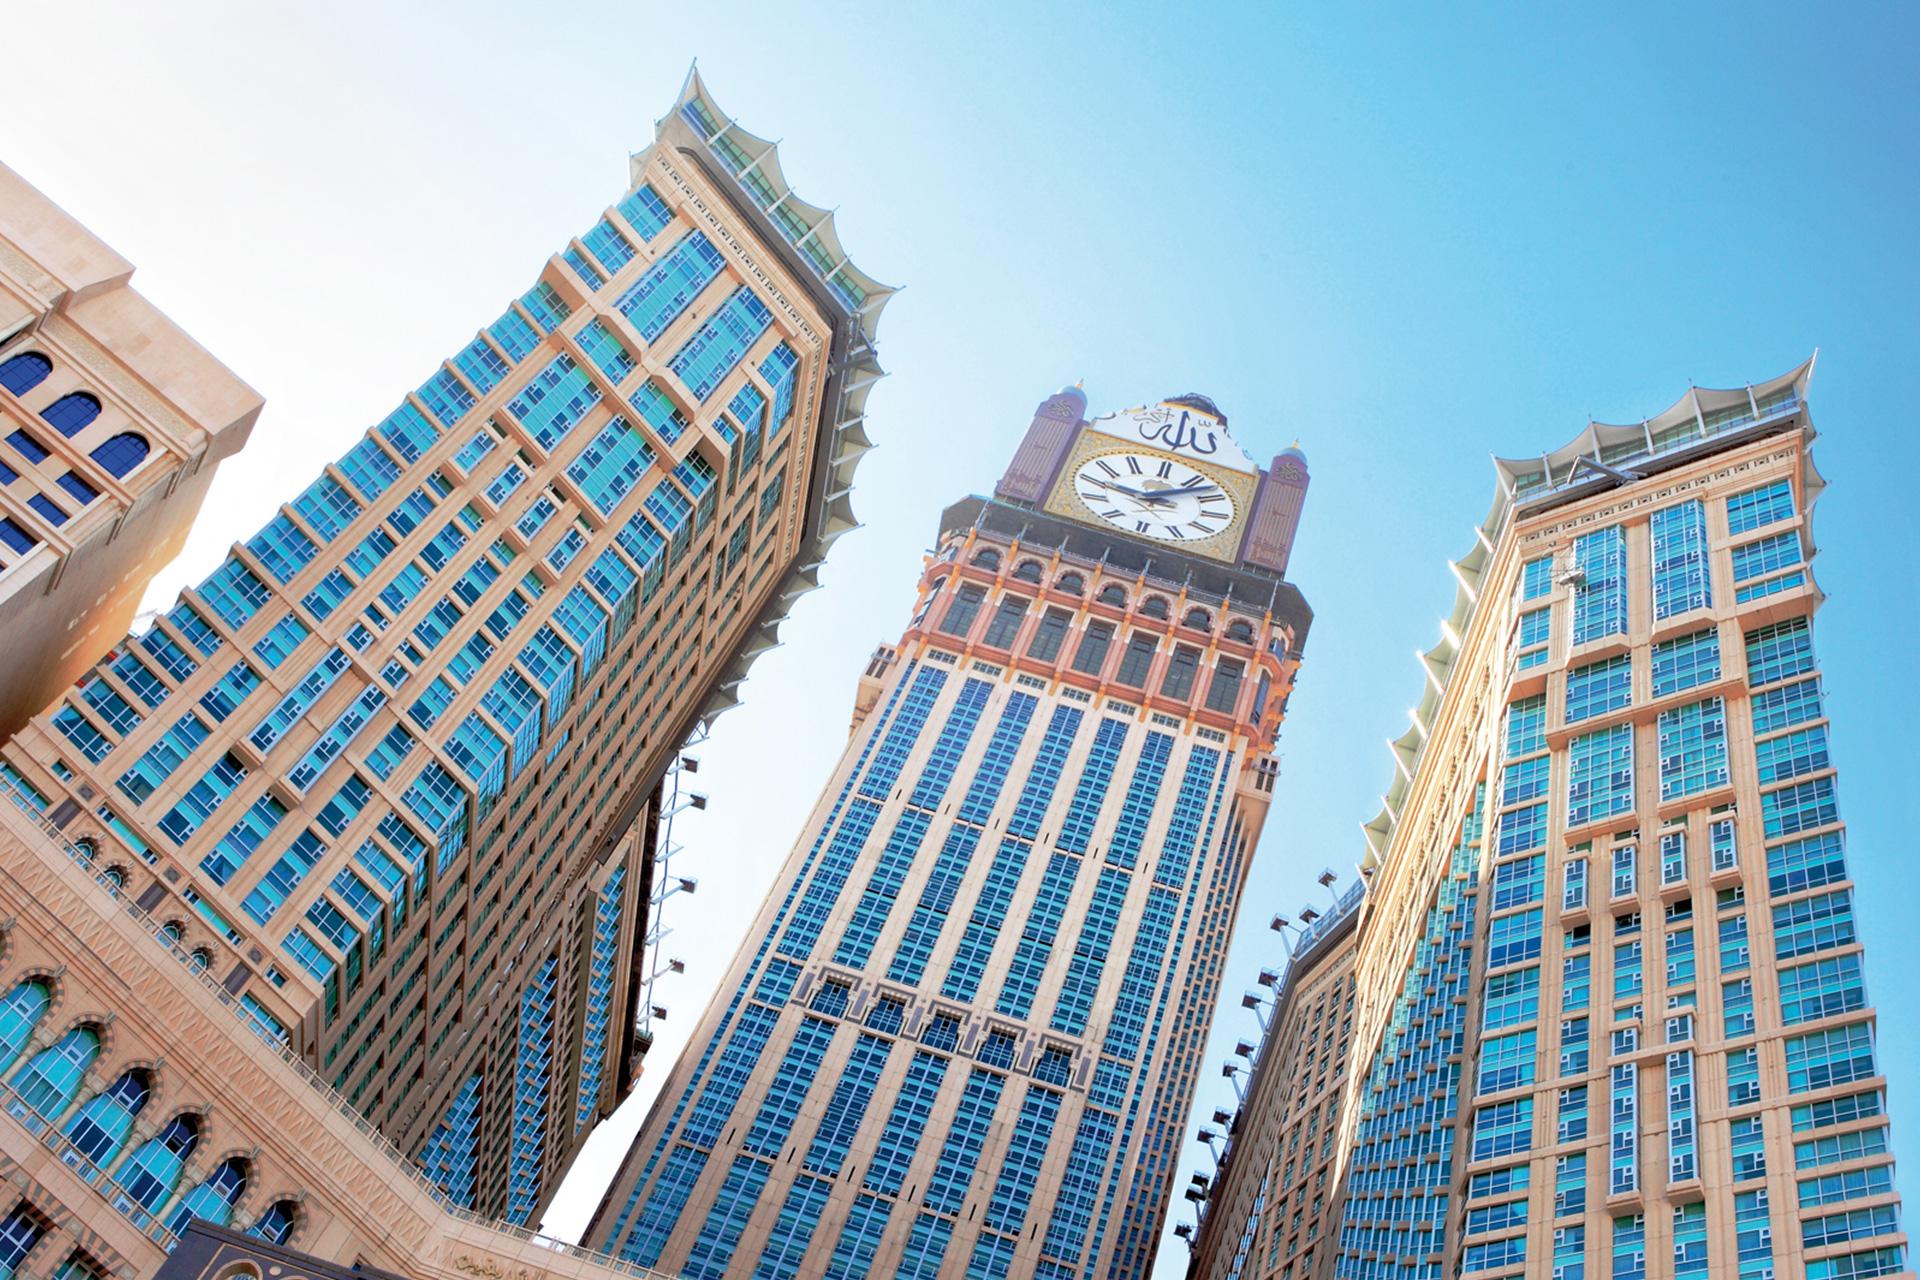 Makkah Royal Clock Tower Makka Saudi Arabia Gutmann